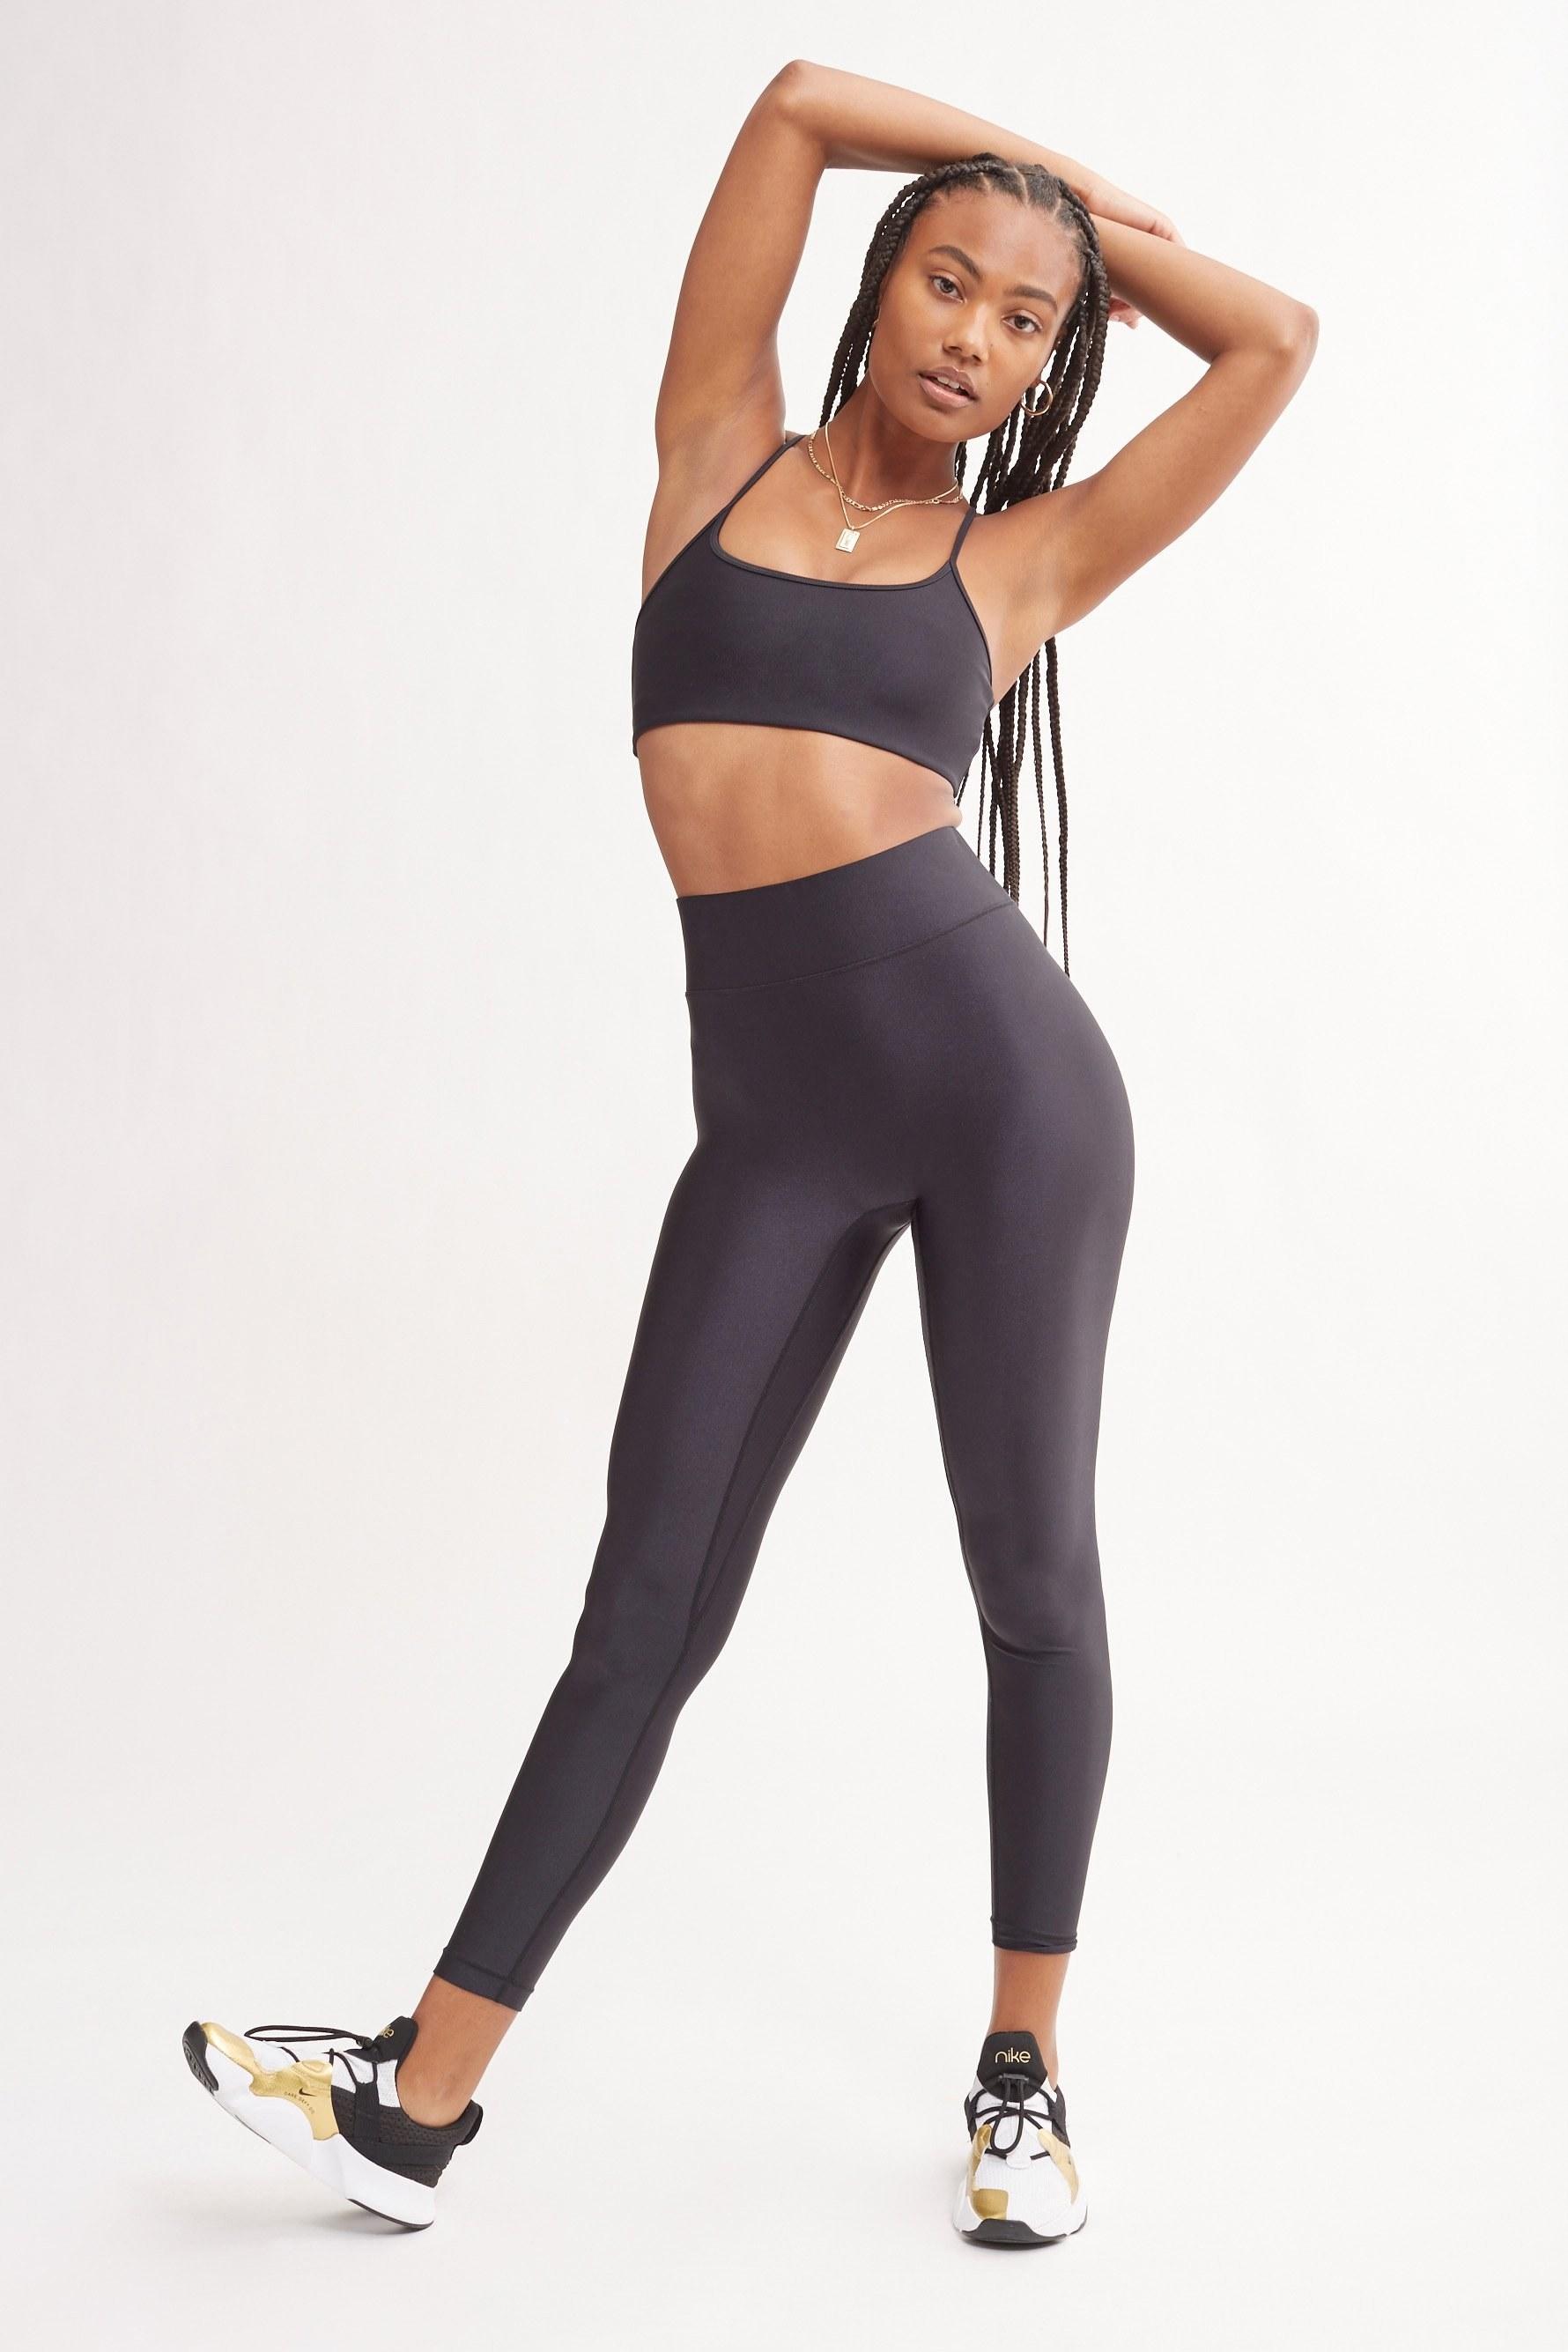 a model in black leggings